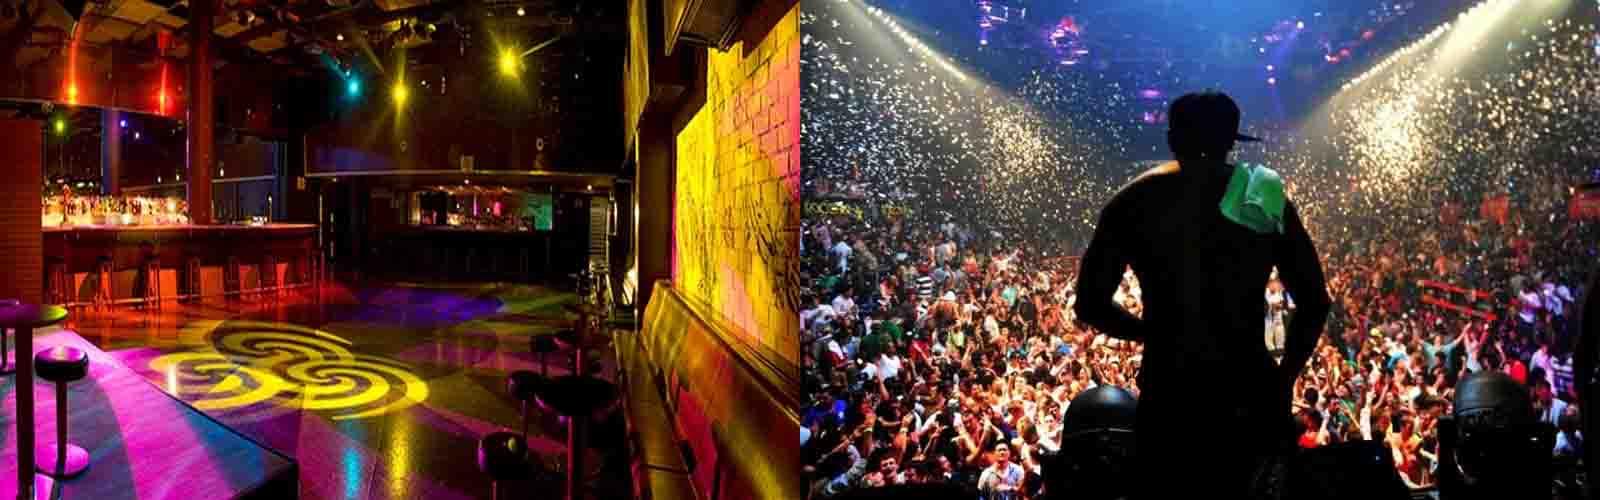 Party to the fullest at Nightclub Bikini